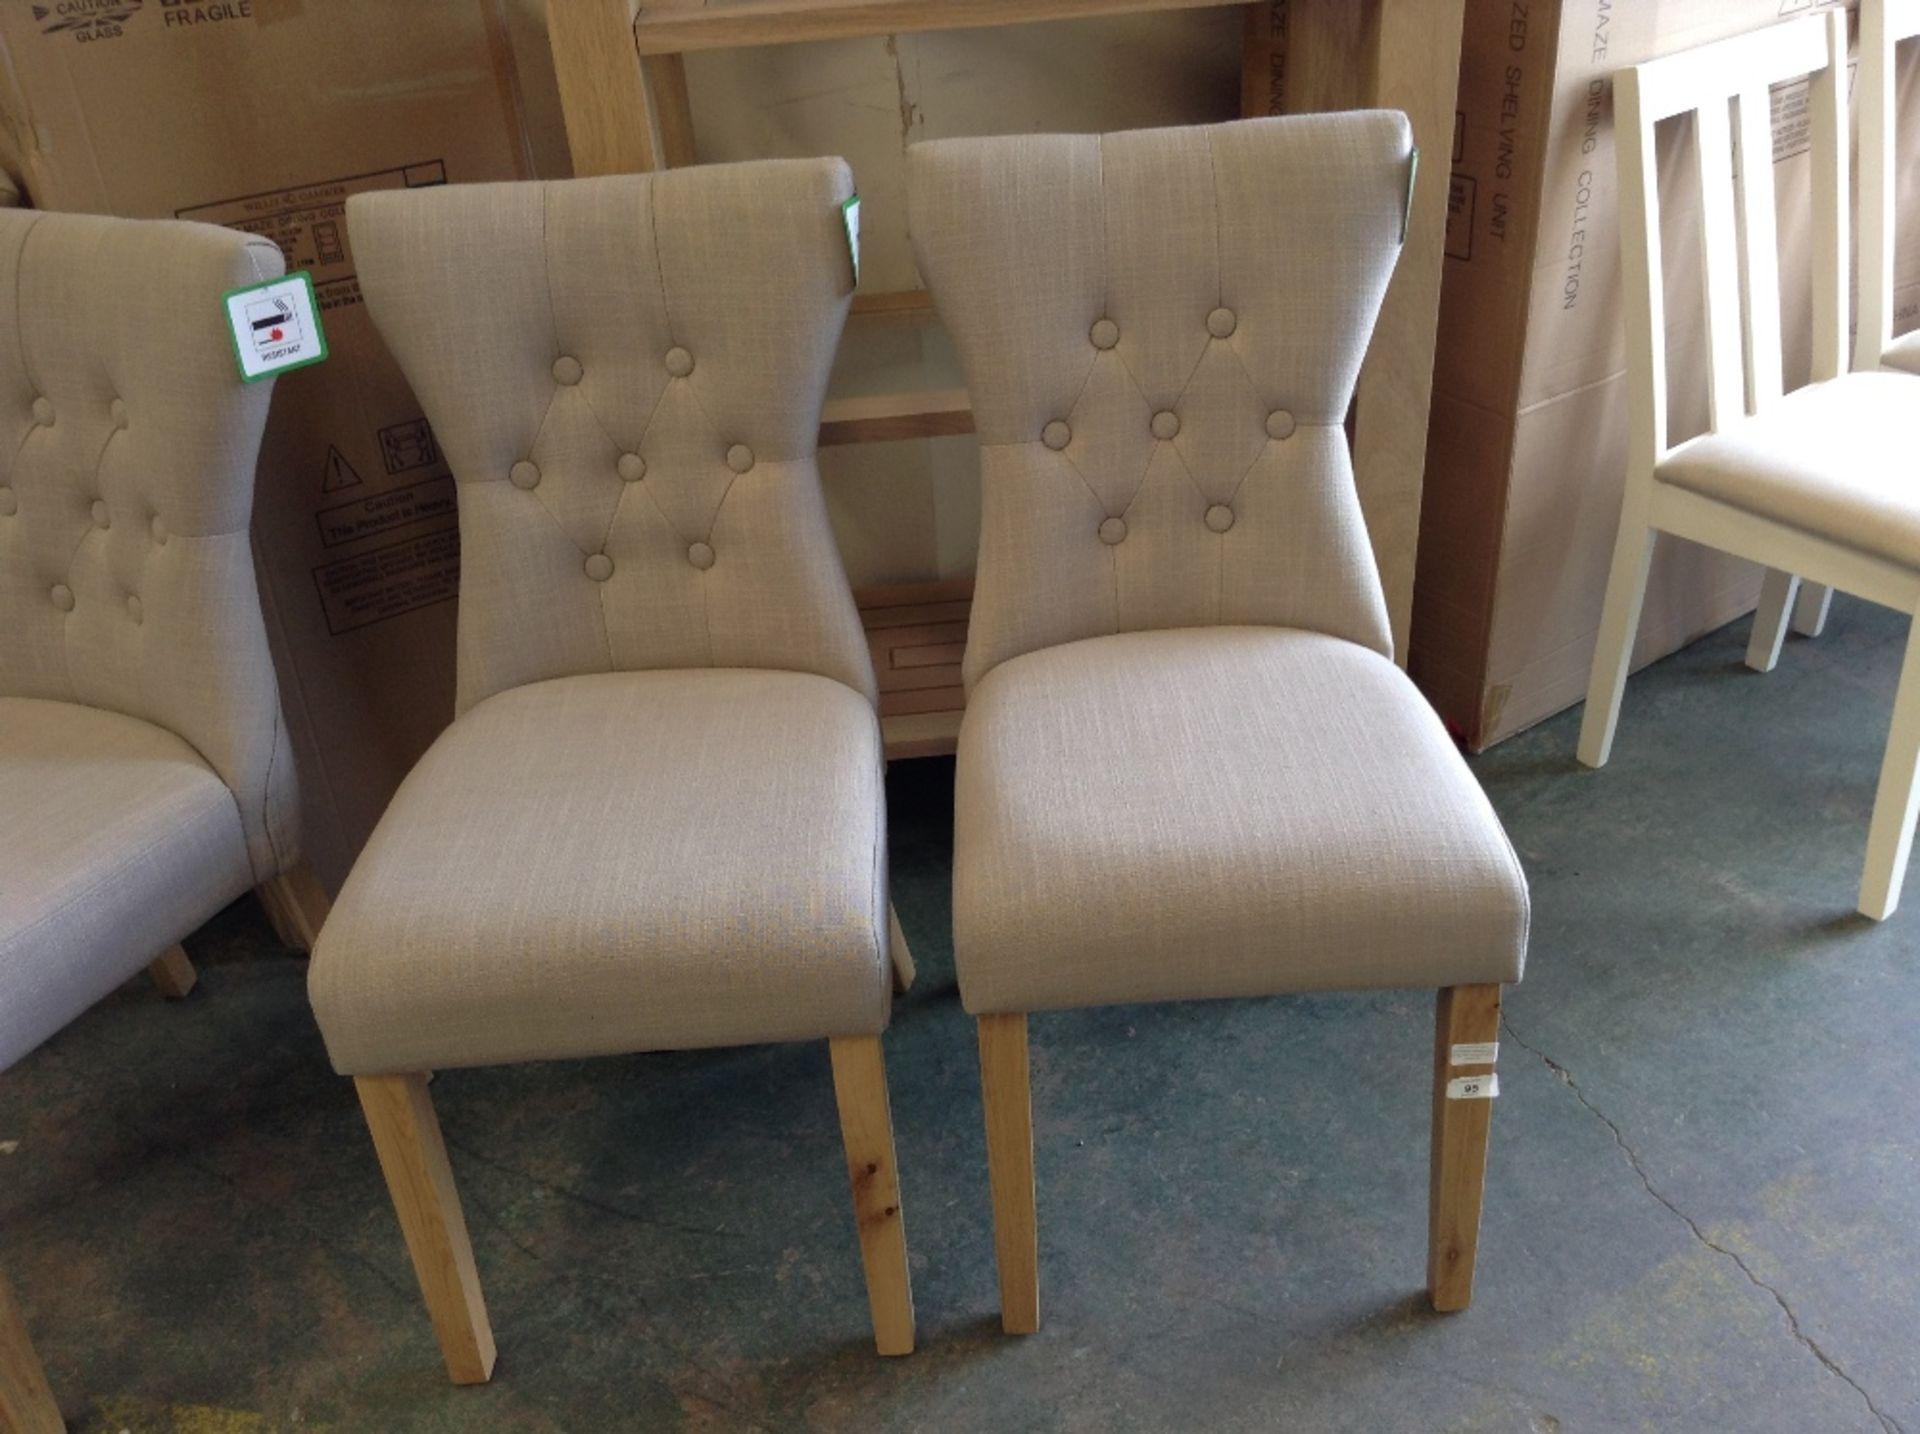 Lot 95 - Fairmont Park Wimbledon Upholstered Dining Chair x2(HOHA1247 - 12157/5)